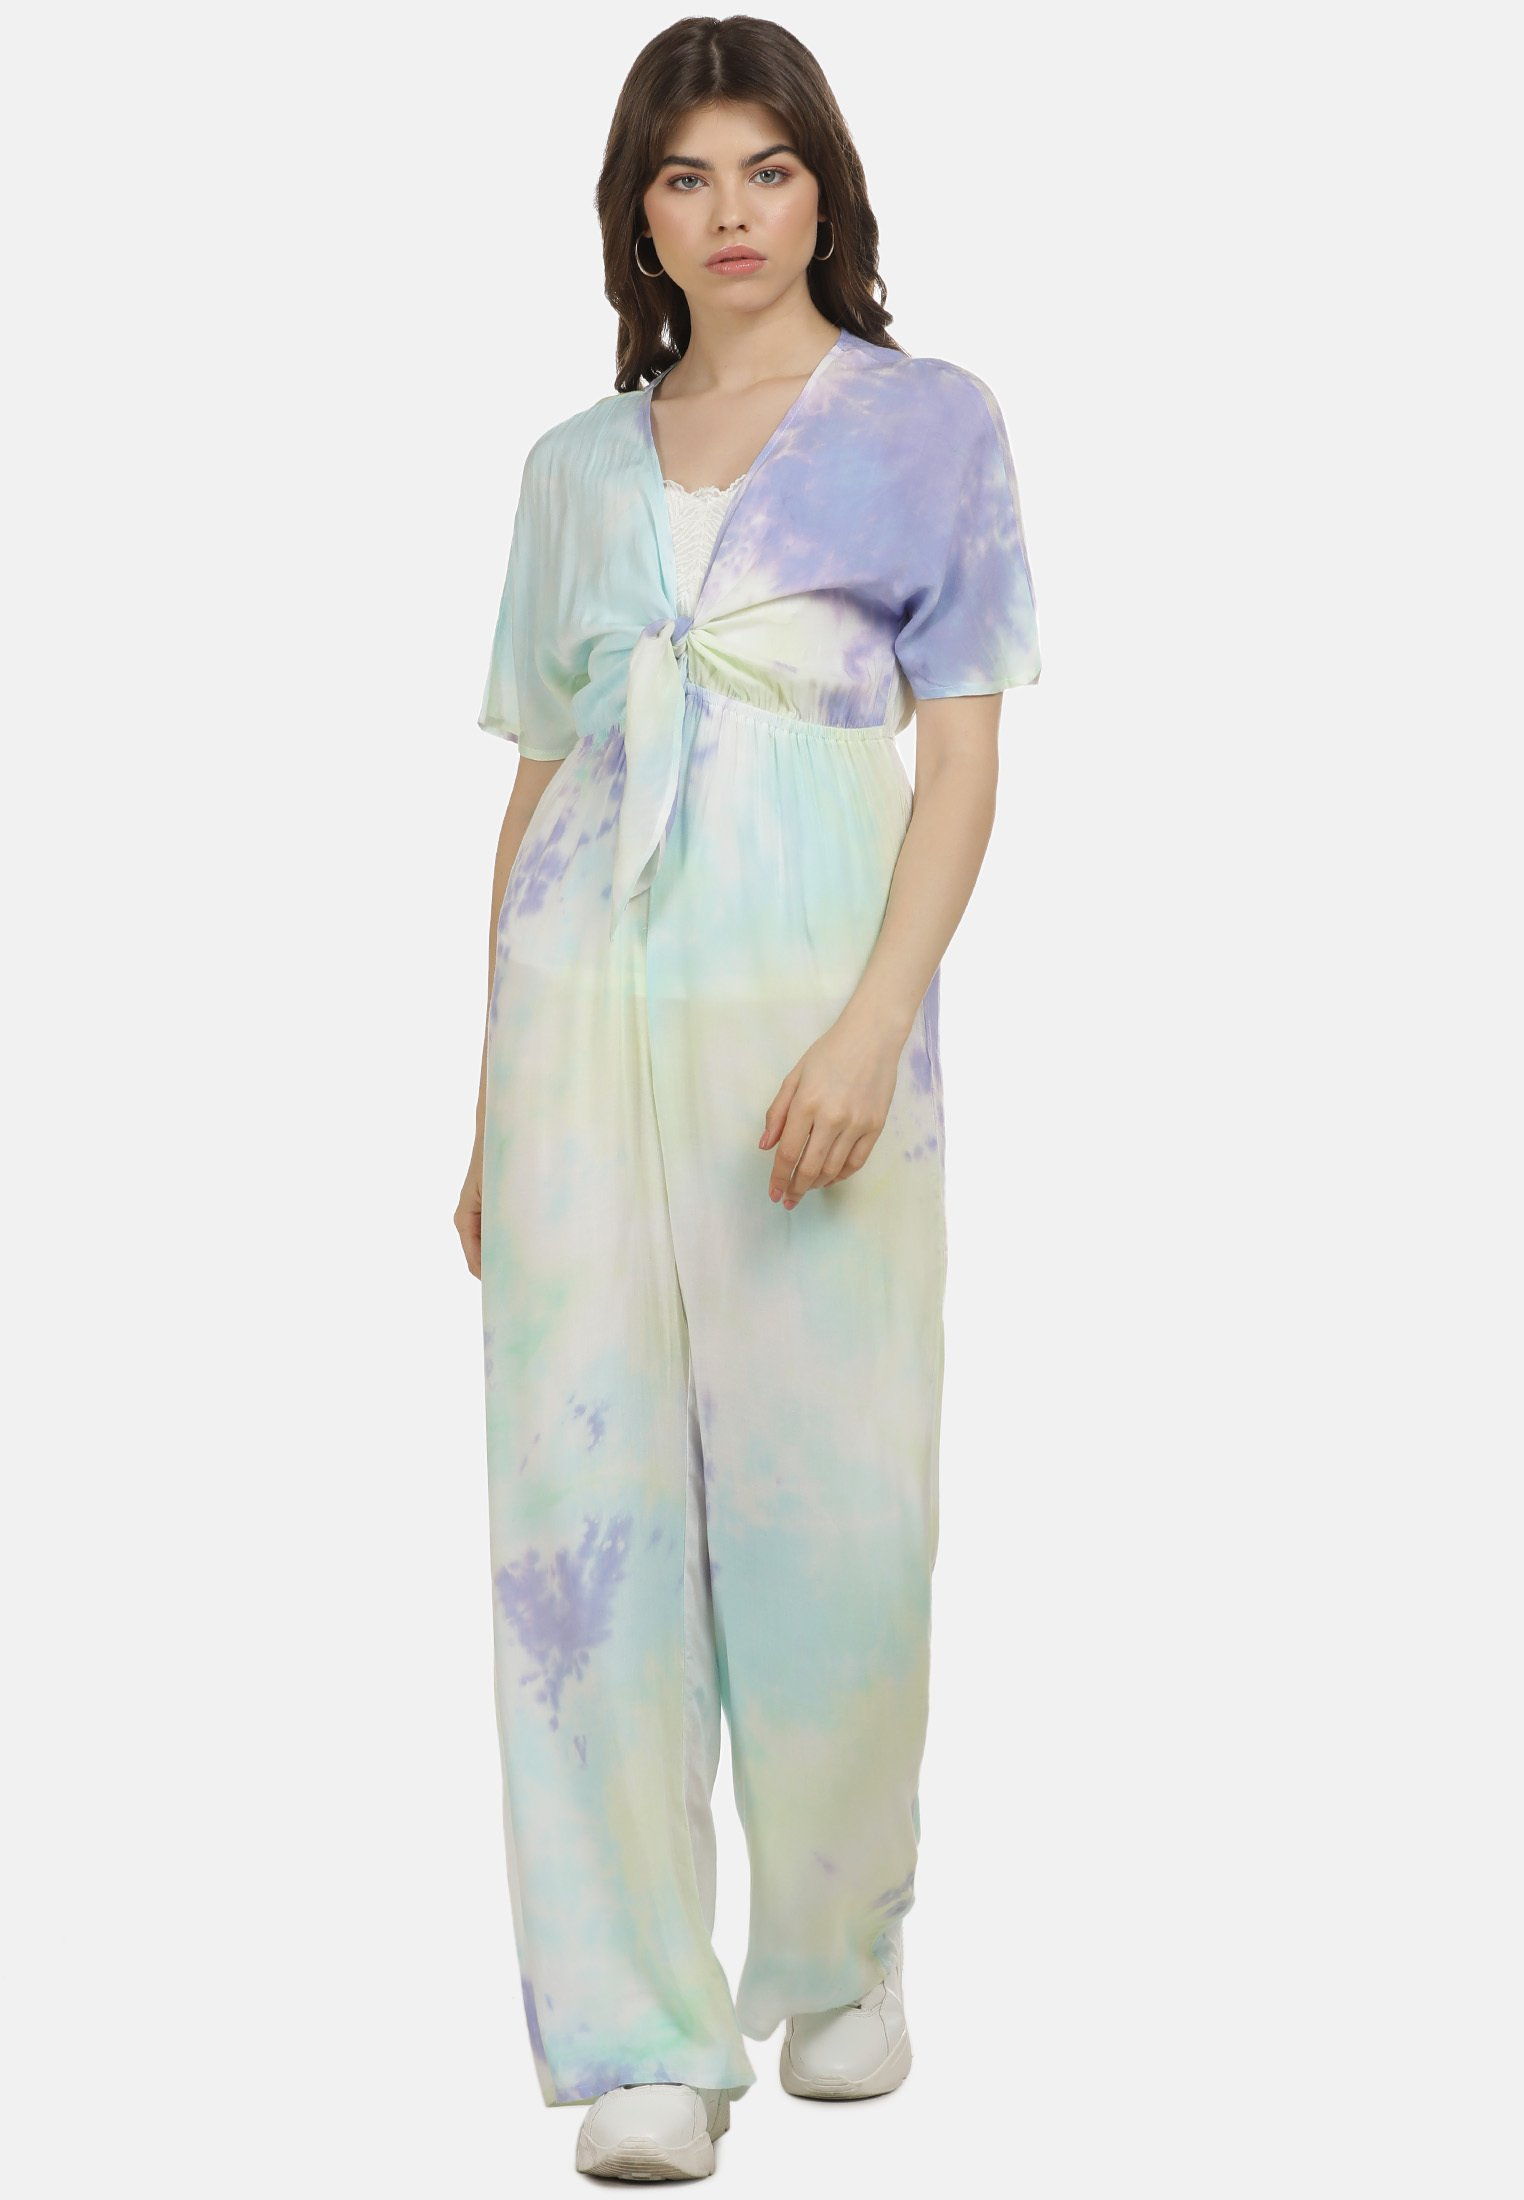 New Styles Women's Clothing myMo Jumpsuit multicolor 3RaJp2mTe